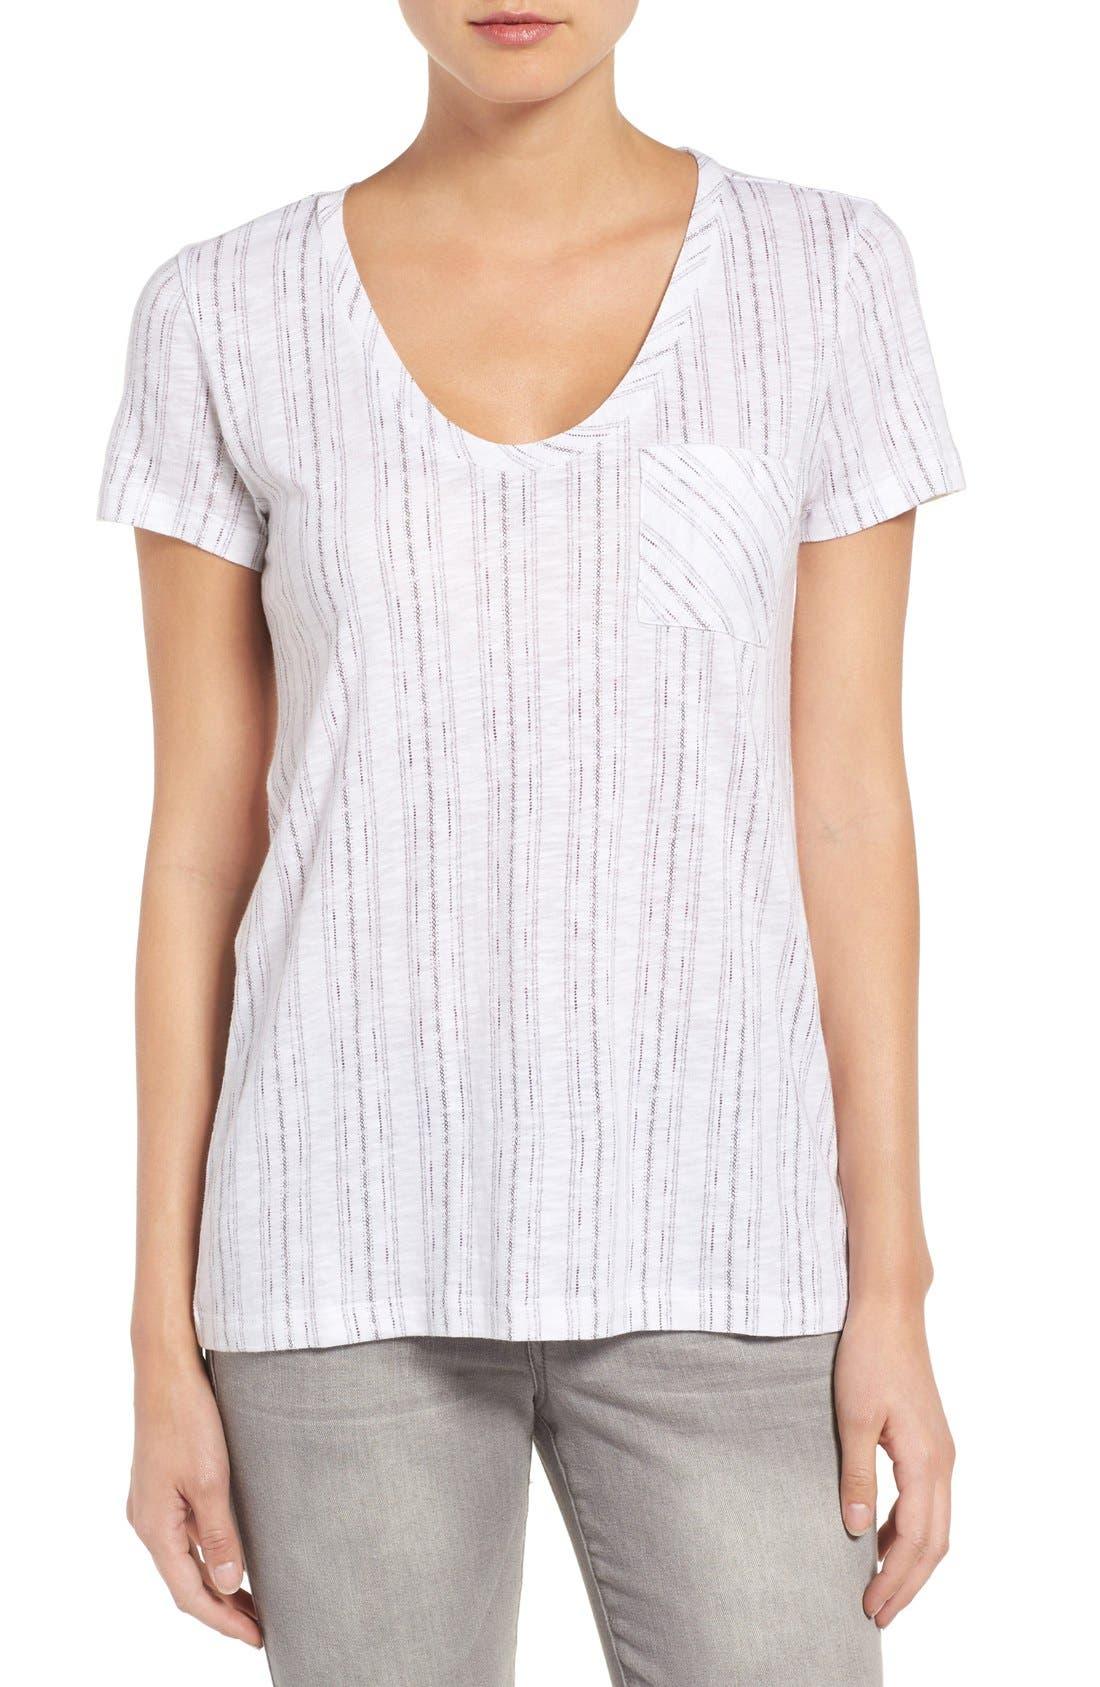 Alternate Image 1 Selected - Caslon® Relaxed Slub Knit U-Neck Tee (Regular & Petite)